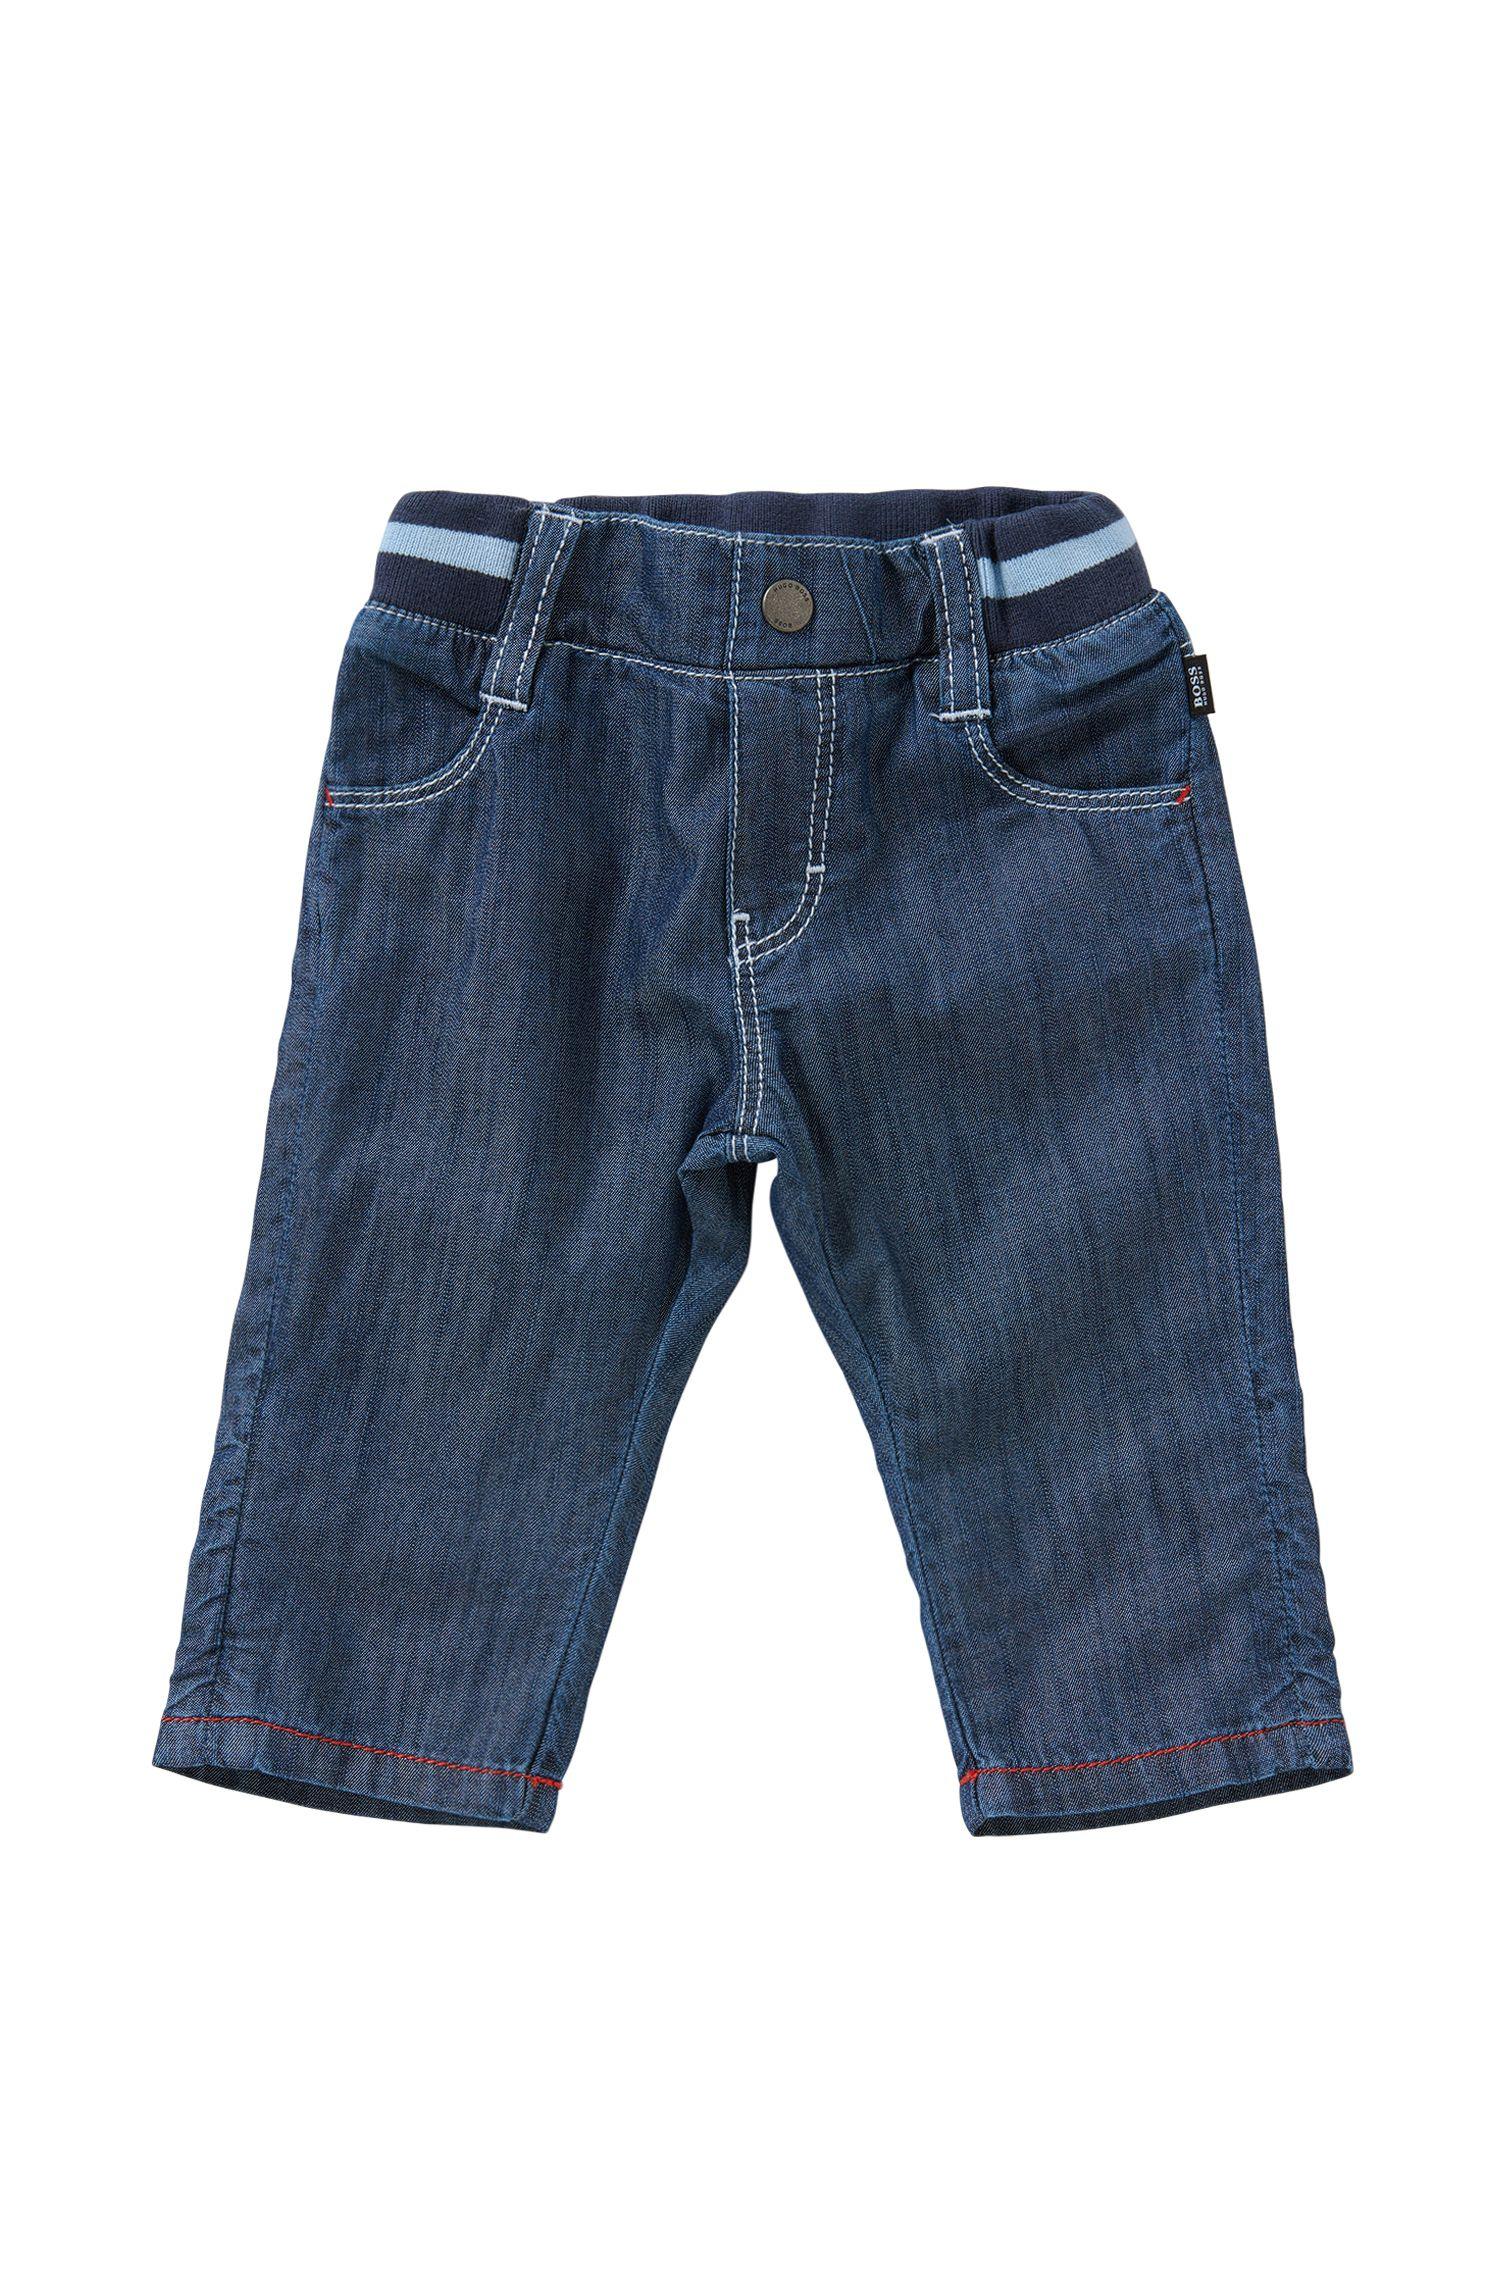 'J94153' | Newborn Stretch Cotton Jeans